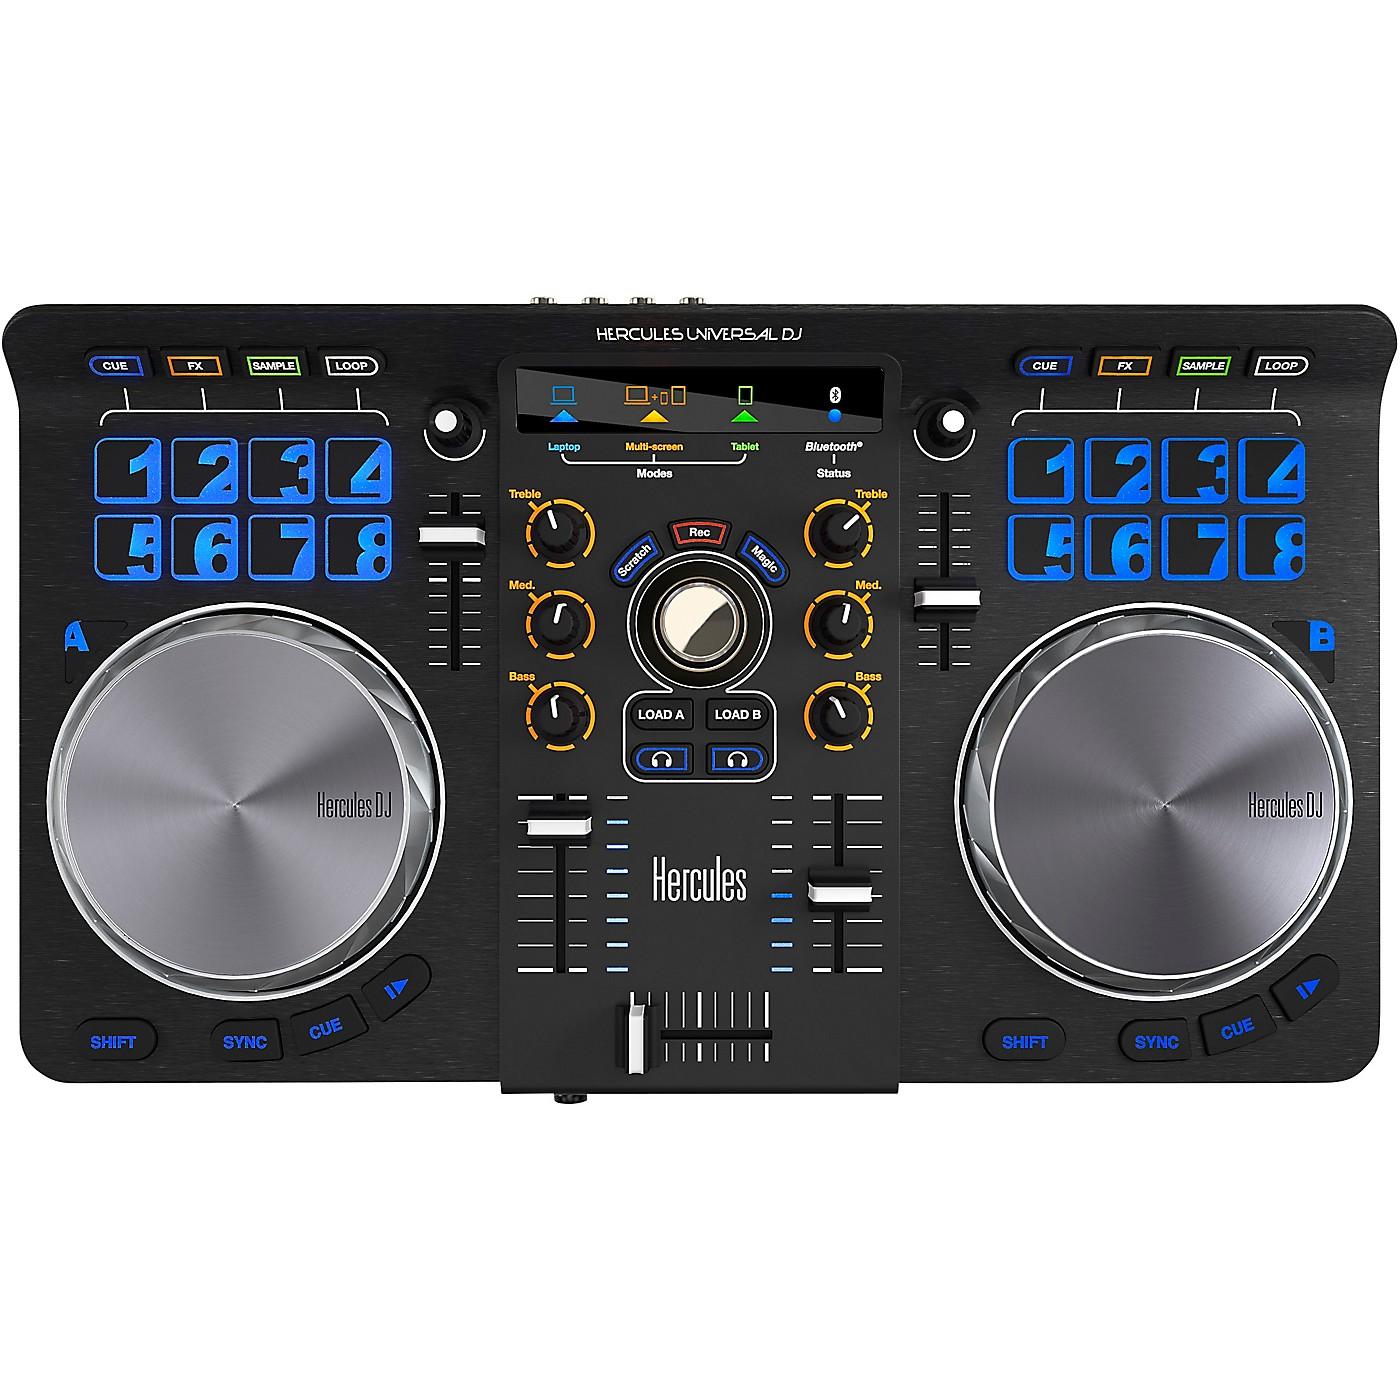 Hercules DJ Universal DJ Compact Controller with Bluetooth thumbnail